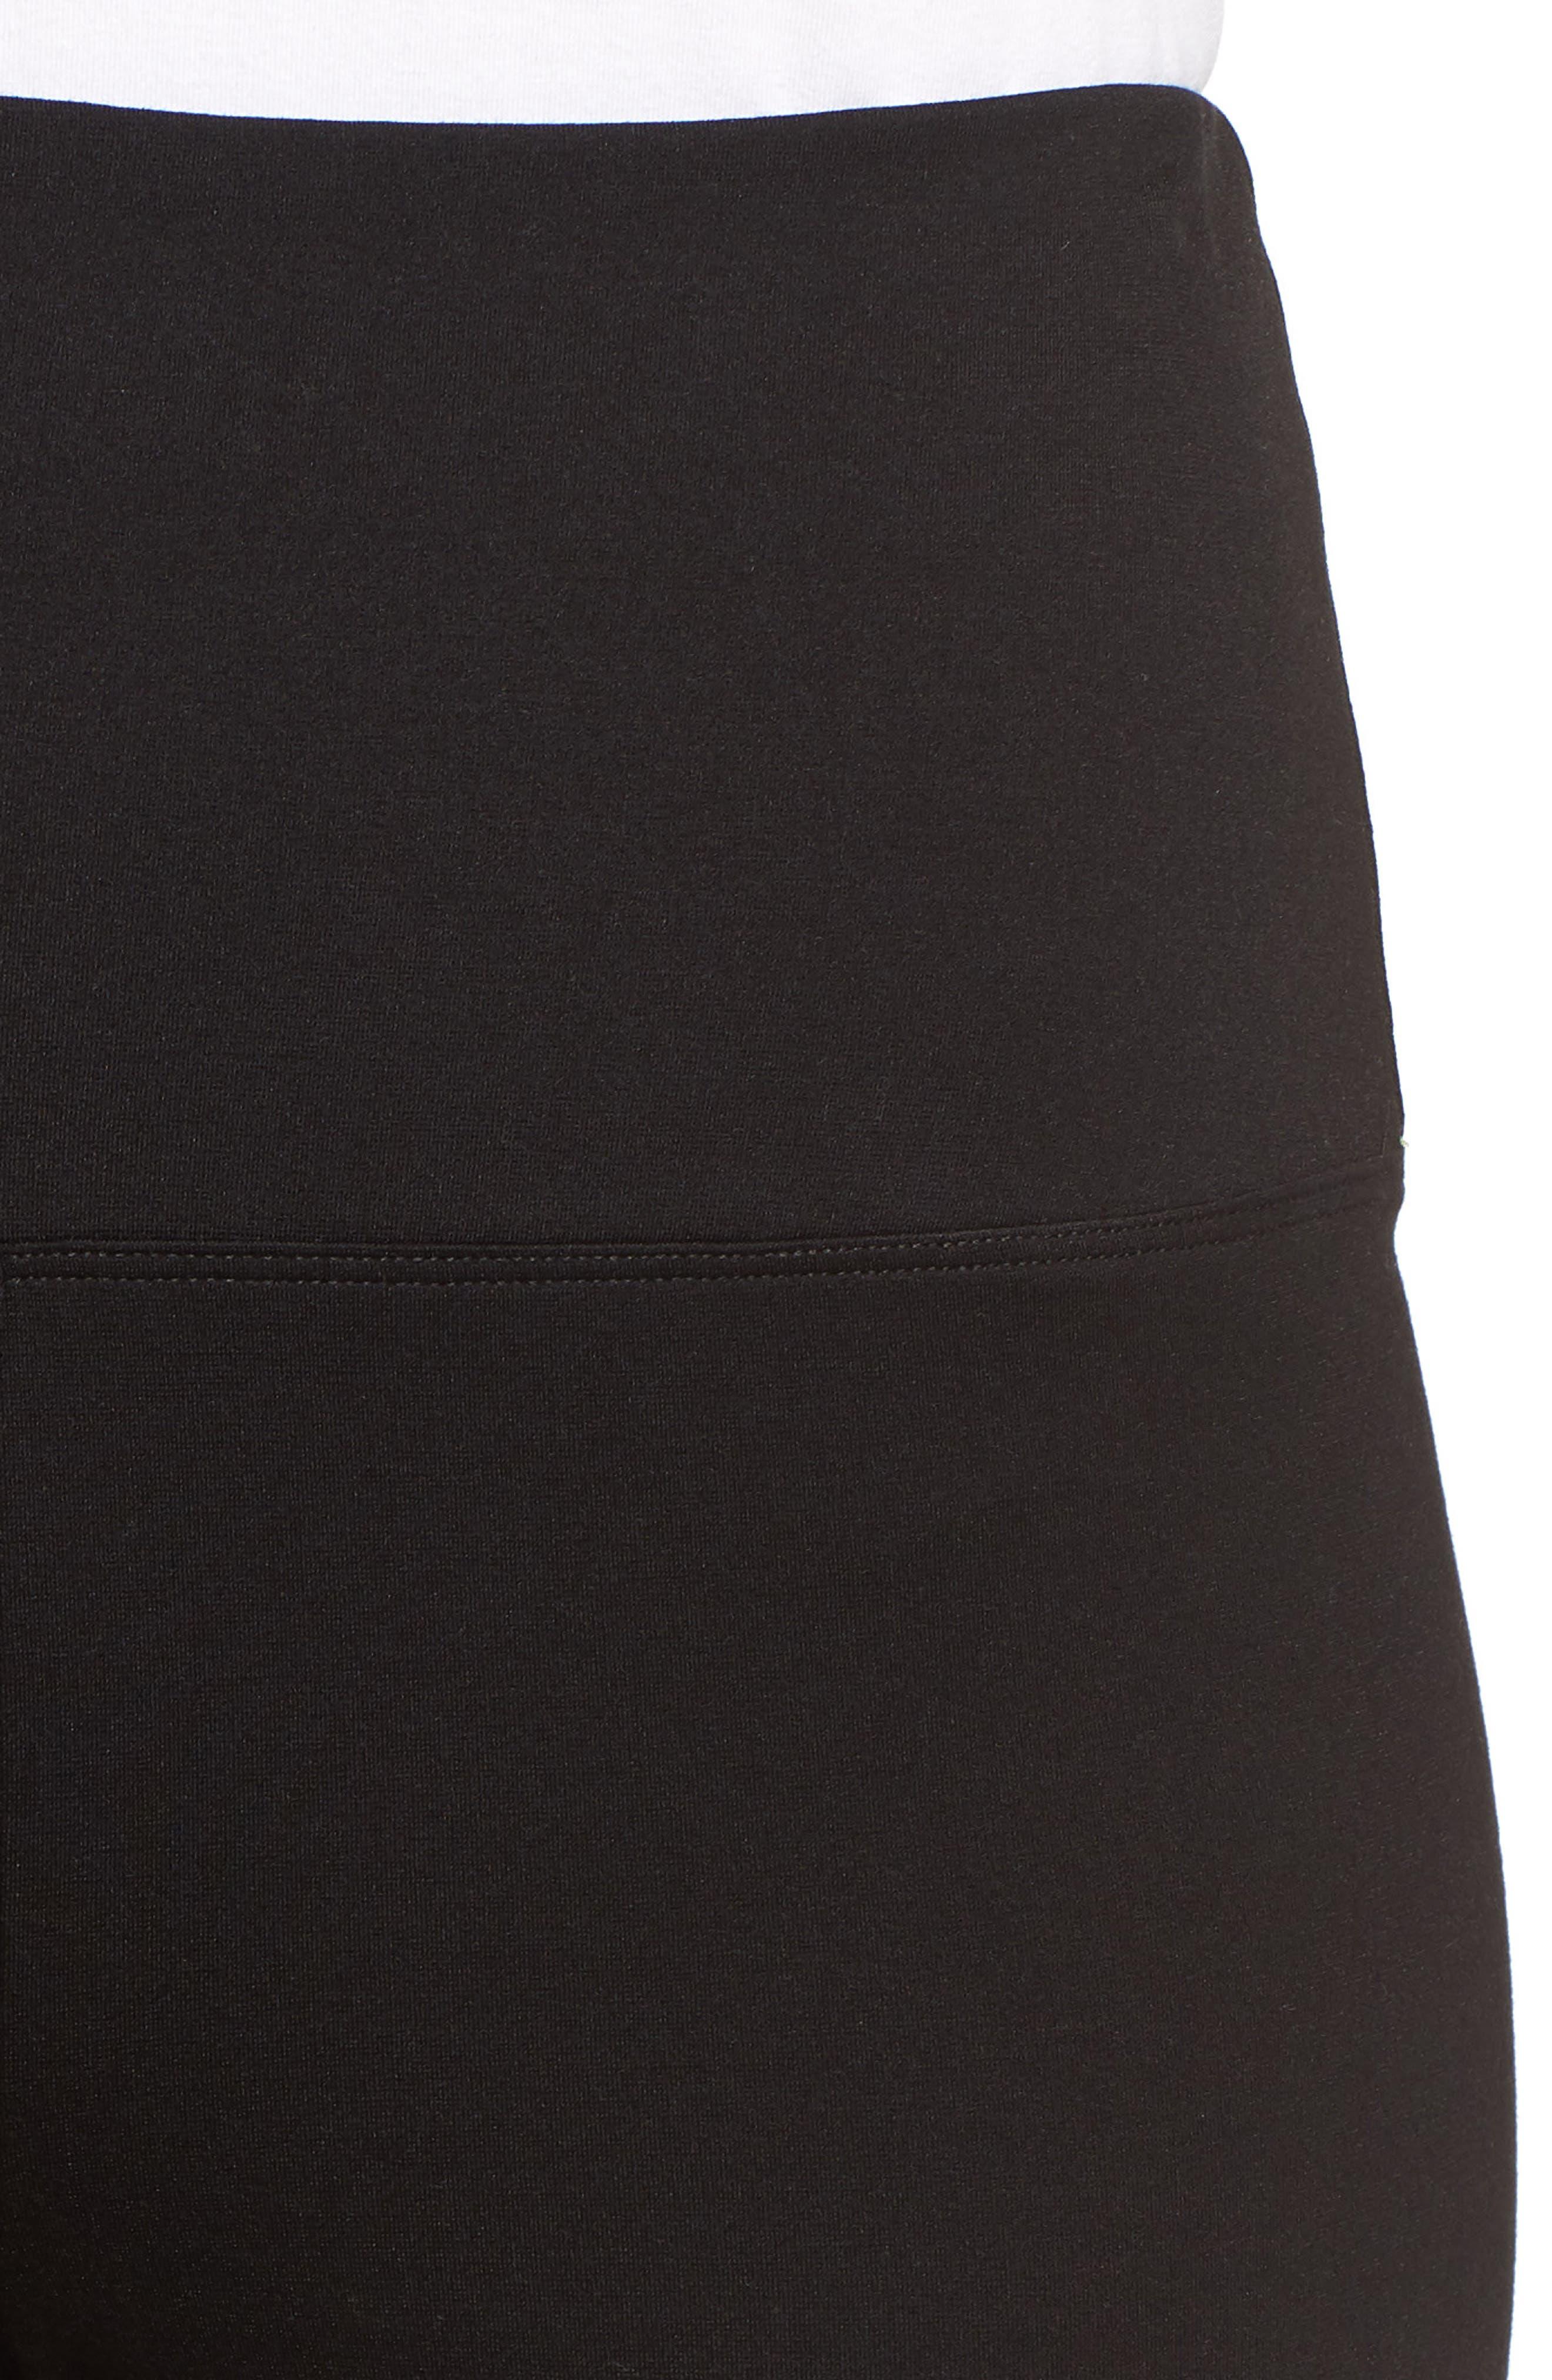 Wide Leg Crop Leggings,                             Alternate thumbnail 4, color,                             BLACK